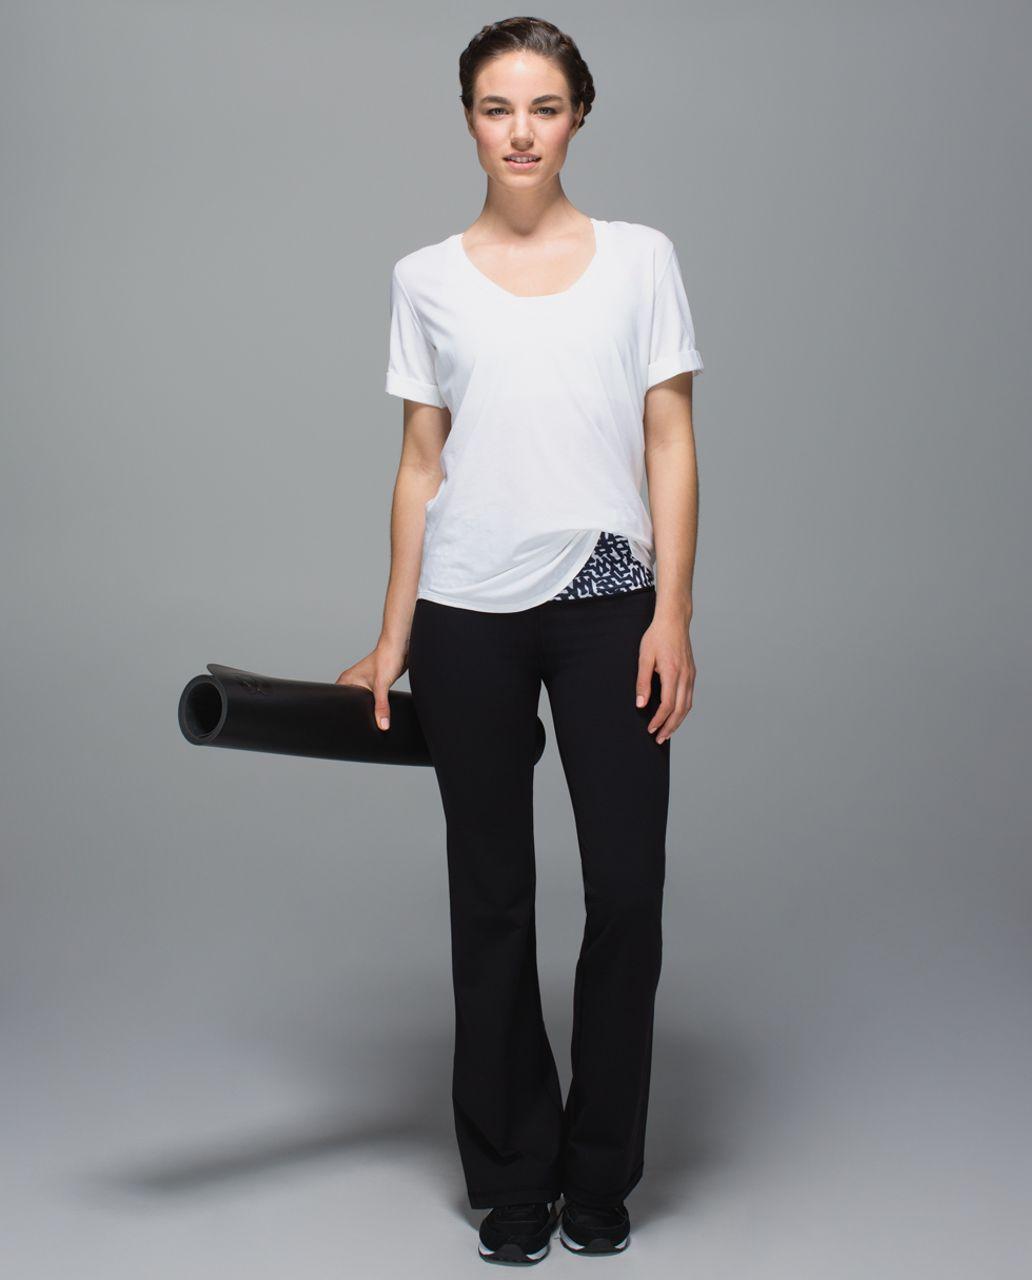 Lululemon Groove Pant II - Black / Net Pop White Black